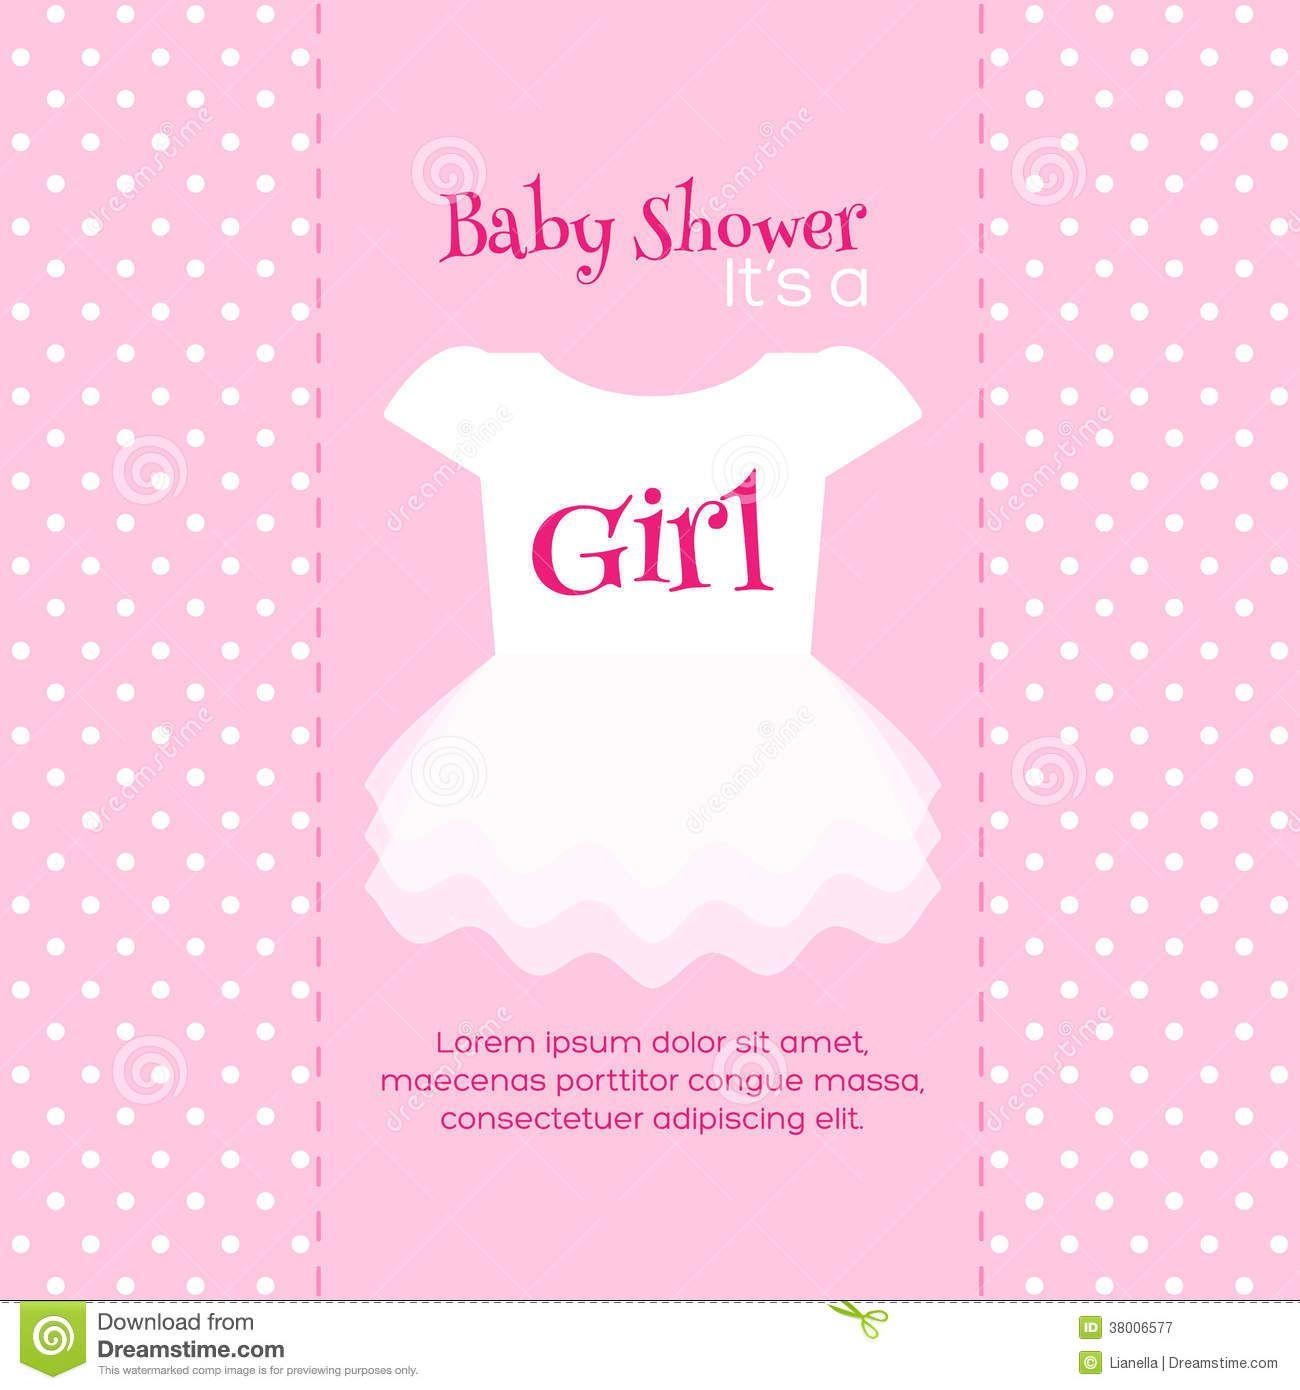 Design Free Printable Baby Shower Invitations For Girls